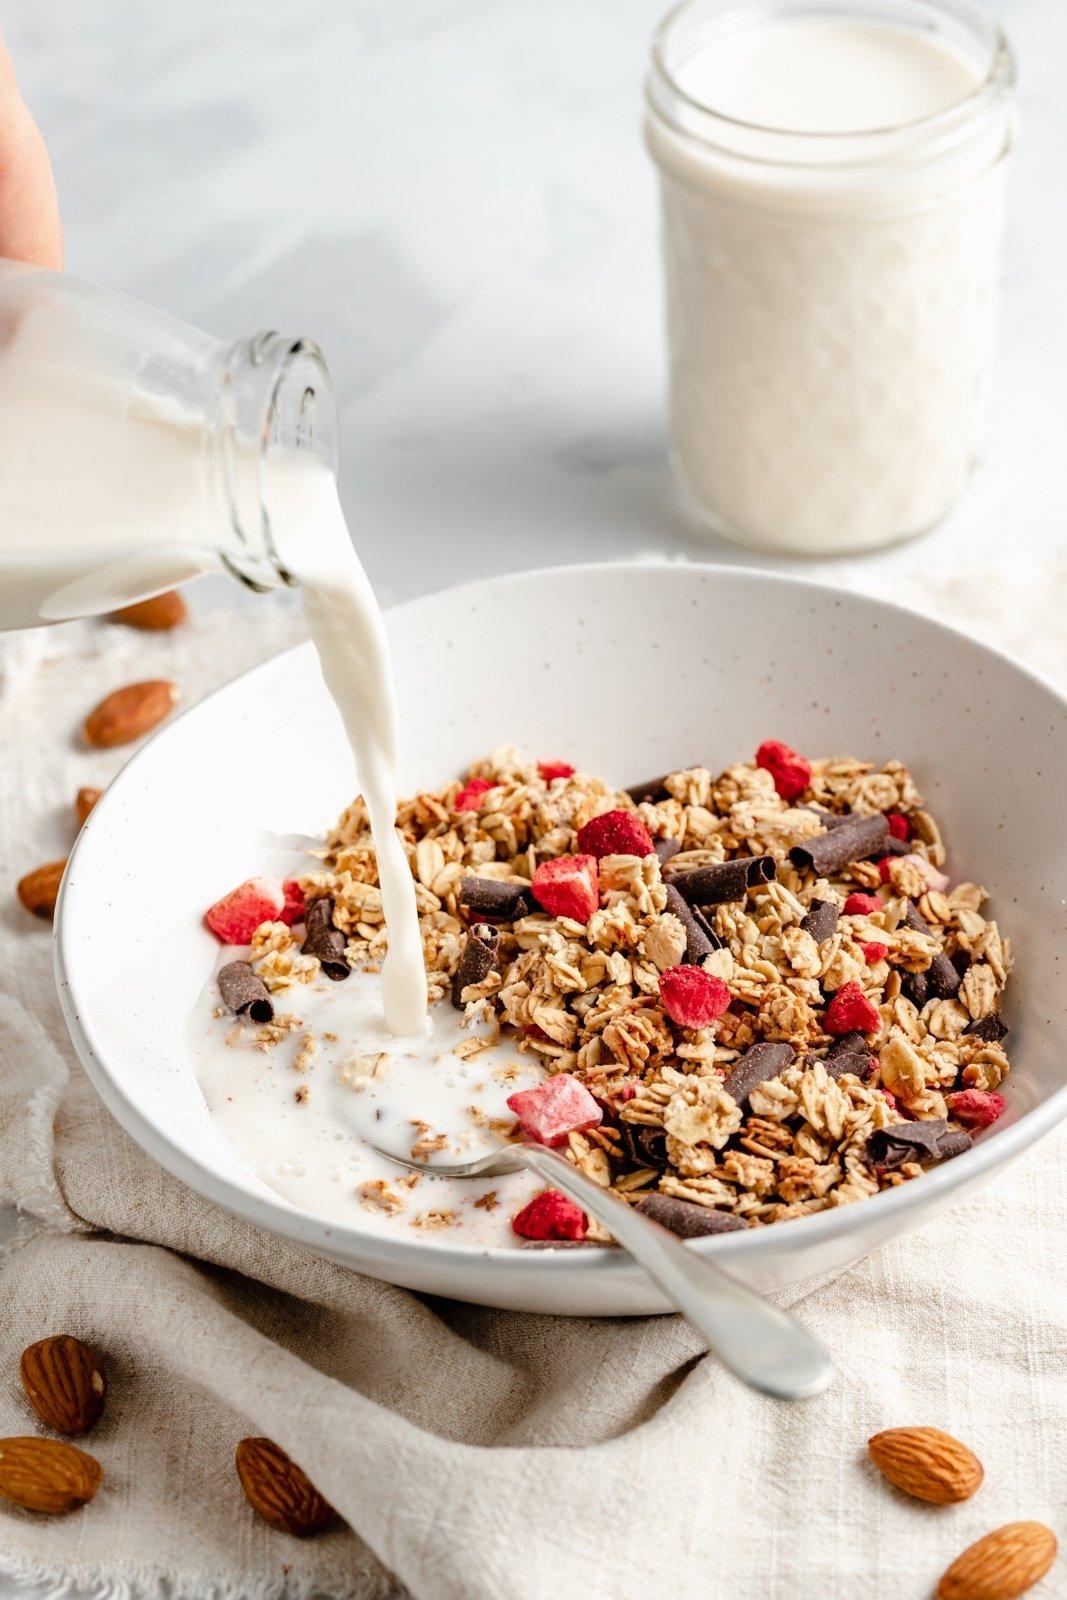 pouring homemade vanilla almond milk into a bowl of granola